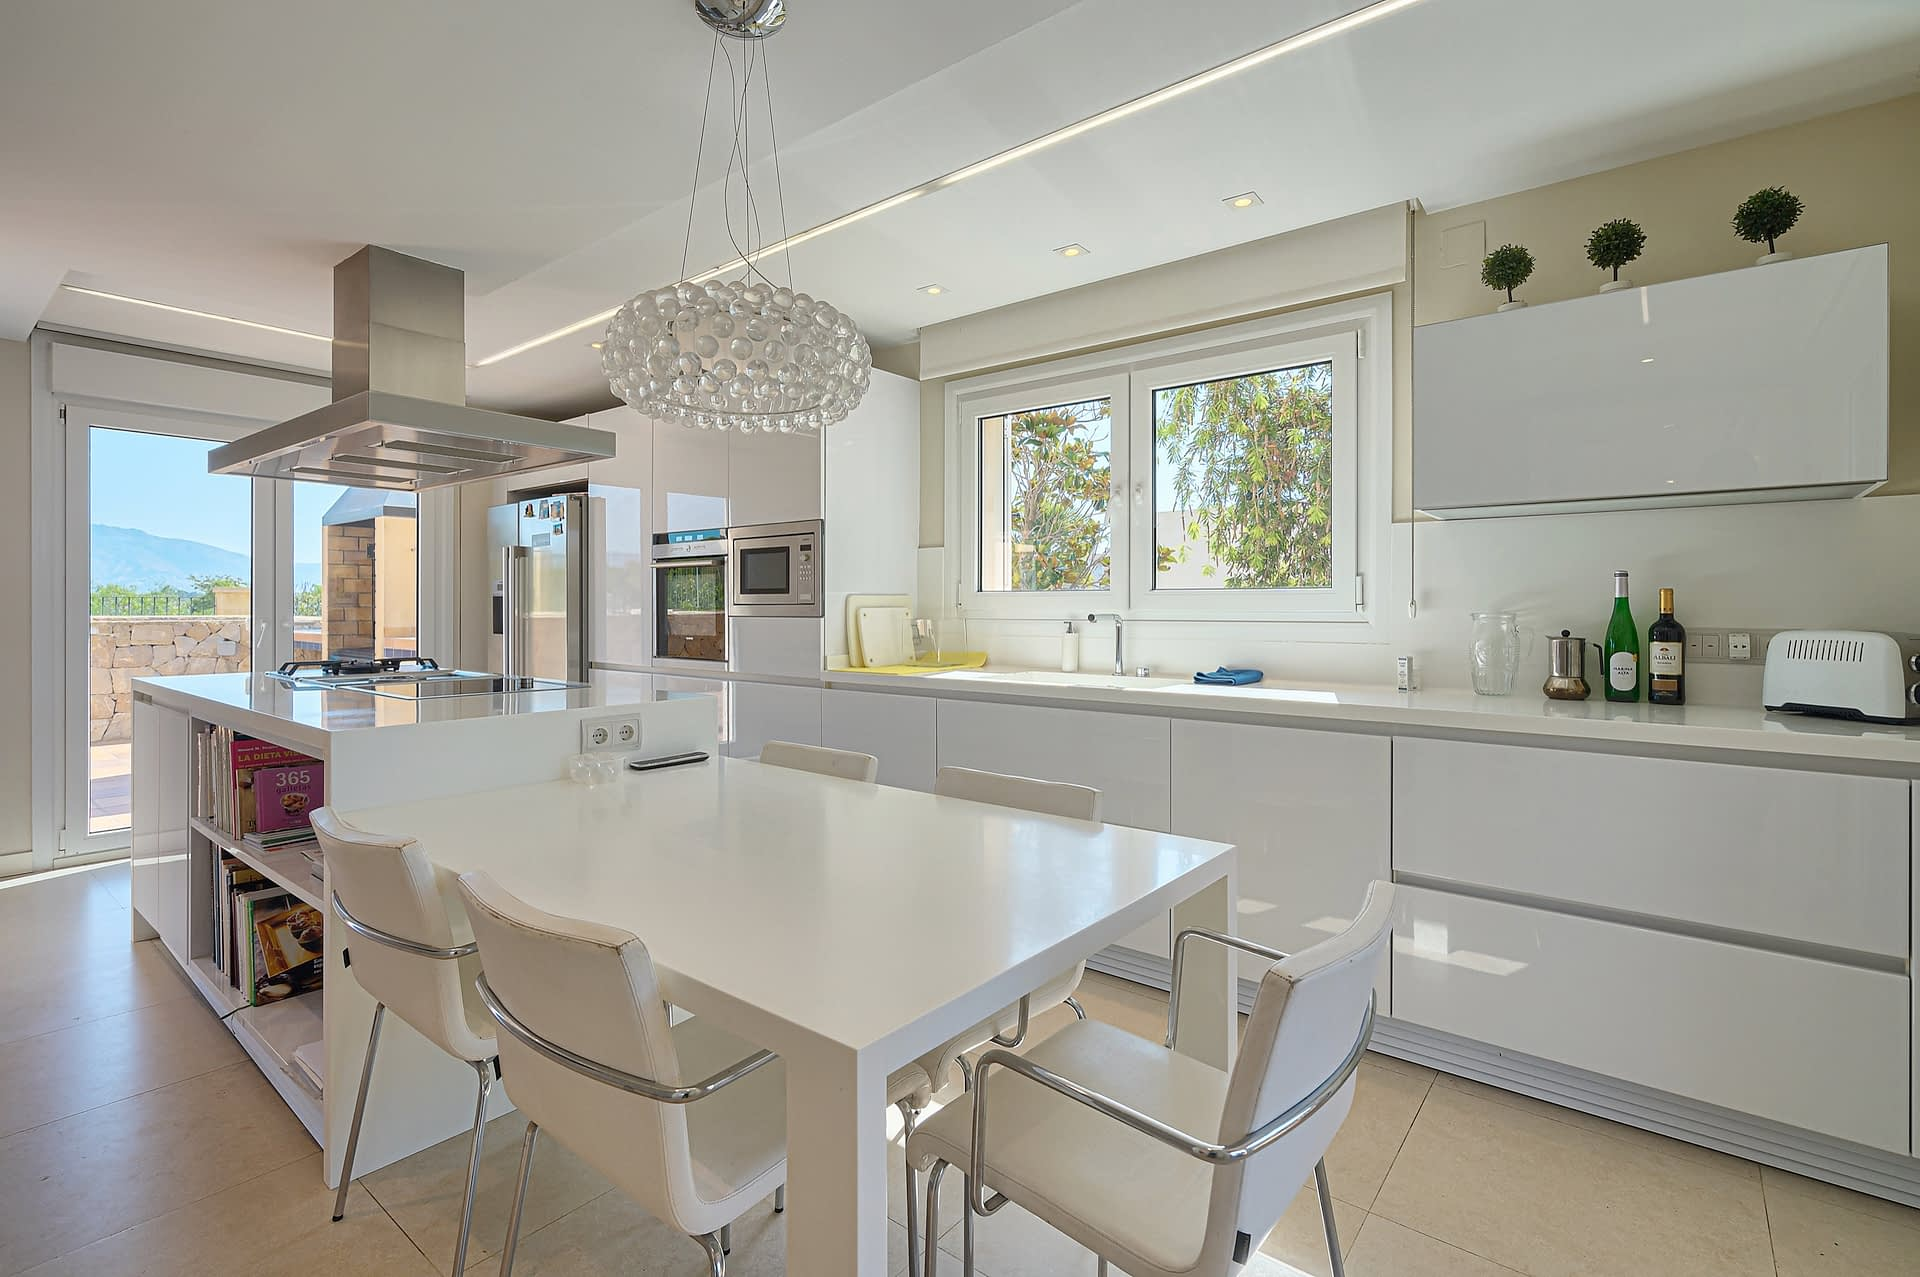 Pierluigi Cavarra - fotografo de Inmobiliaria - real estate photography costa blanca - ejemplo17